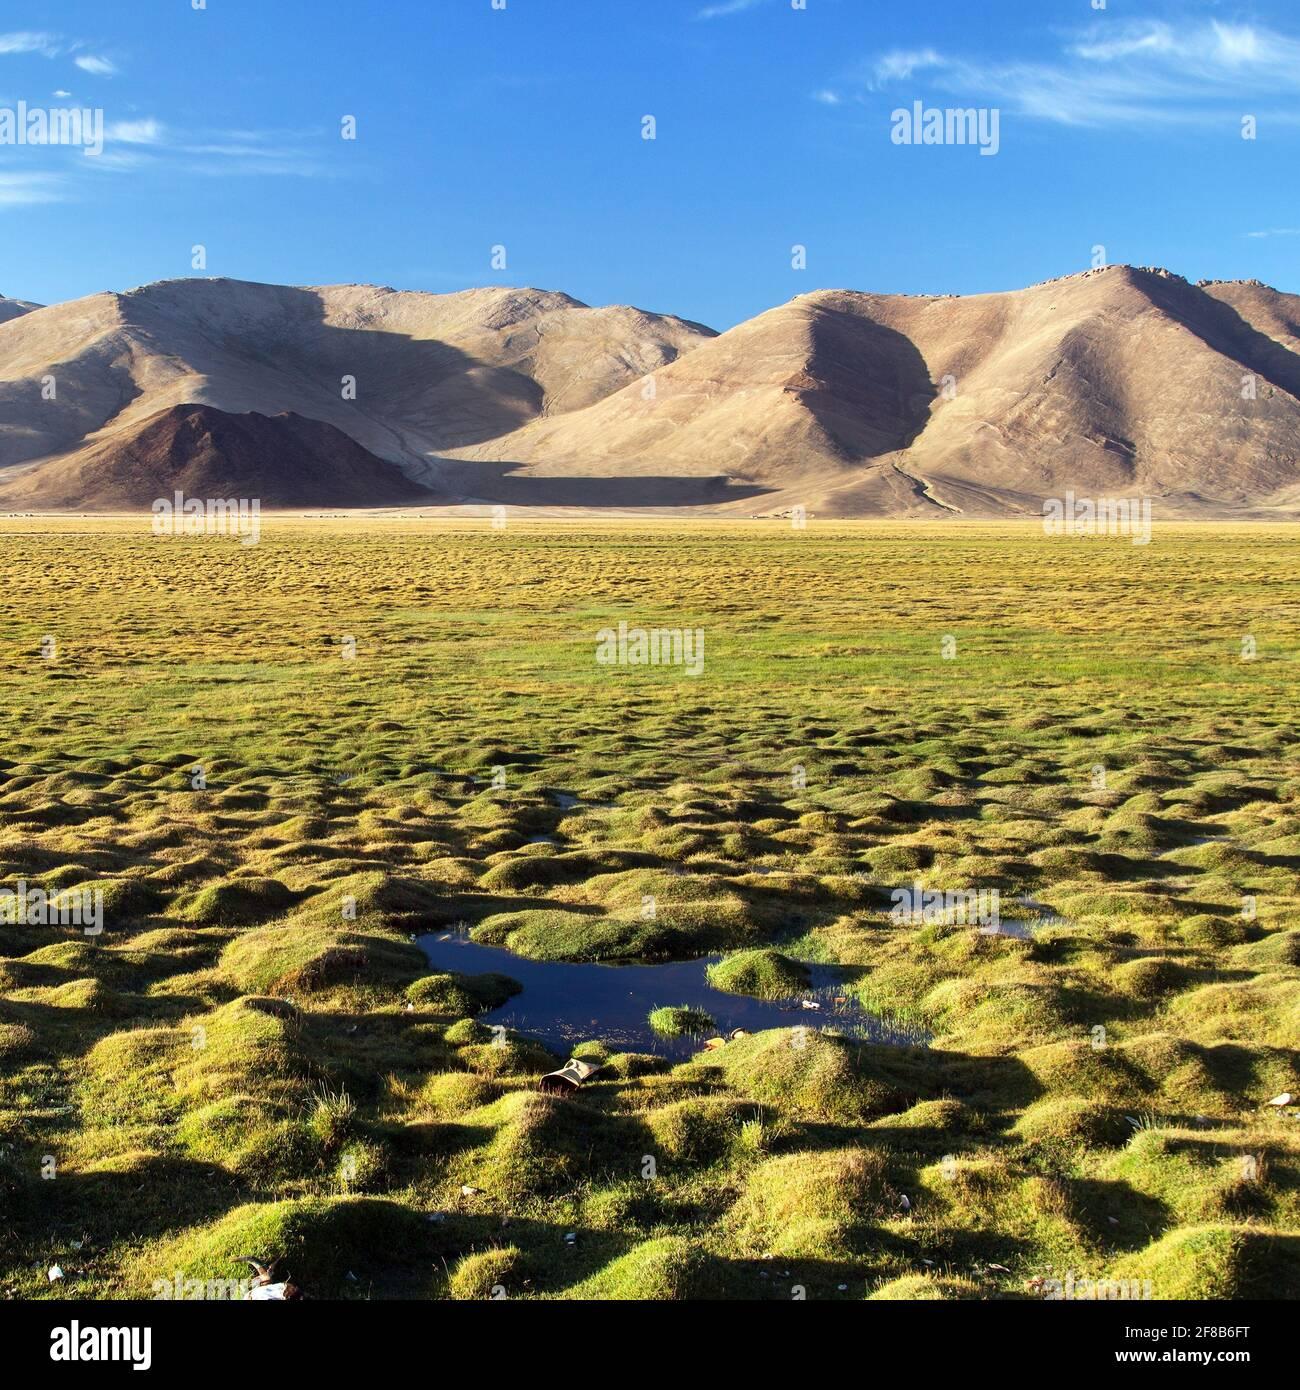 Montañas Pamir en Tayikistán. Paisaje alrededor de la carretera internacional Pamir M41. Foto de stock